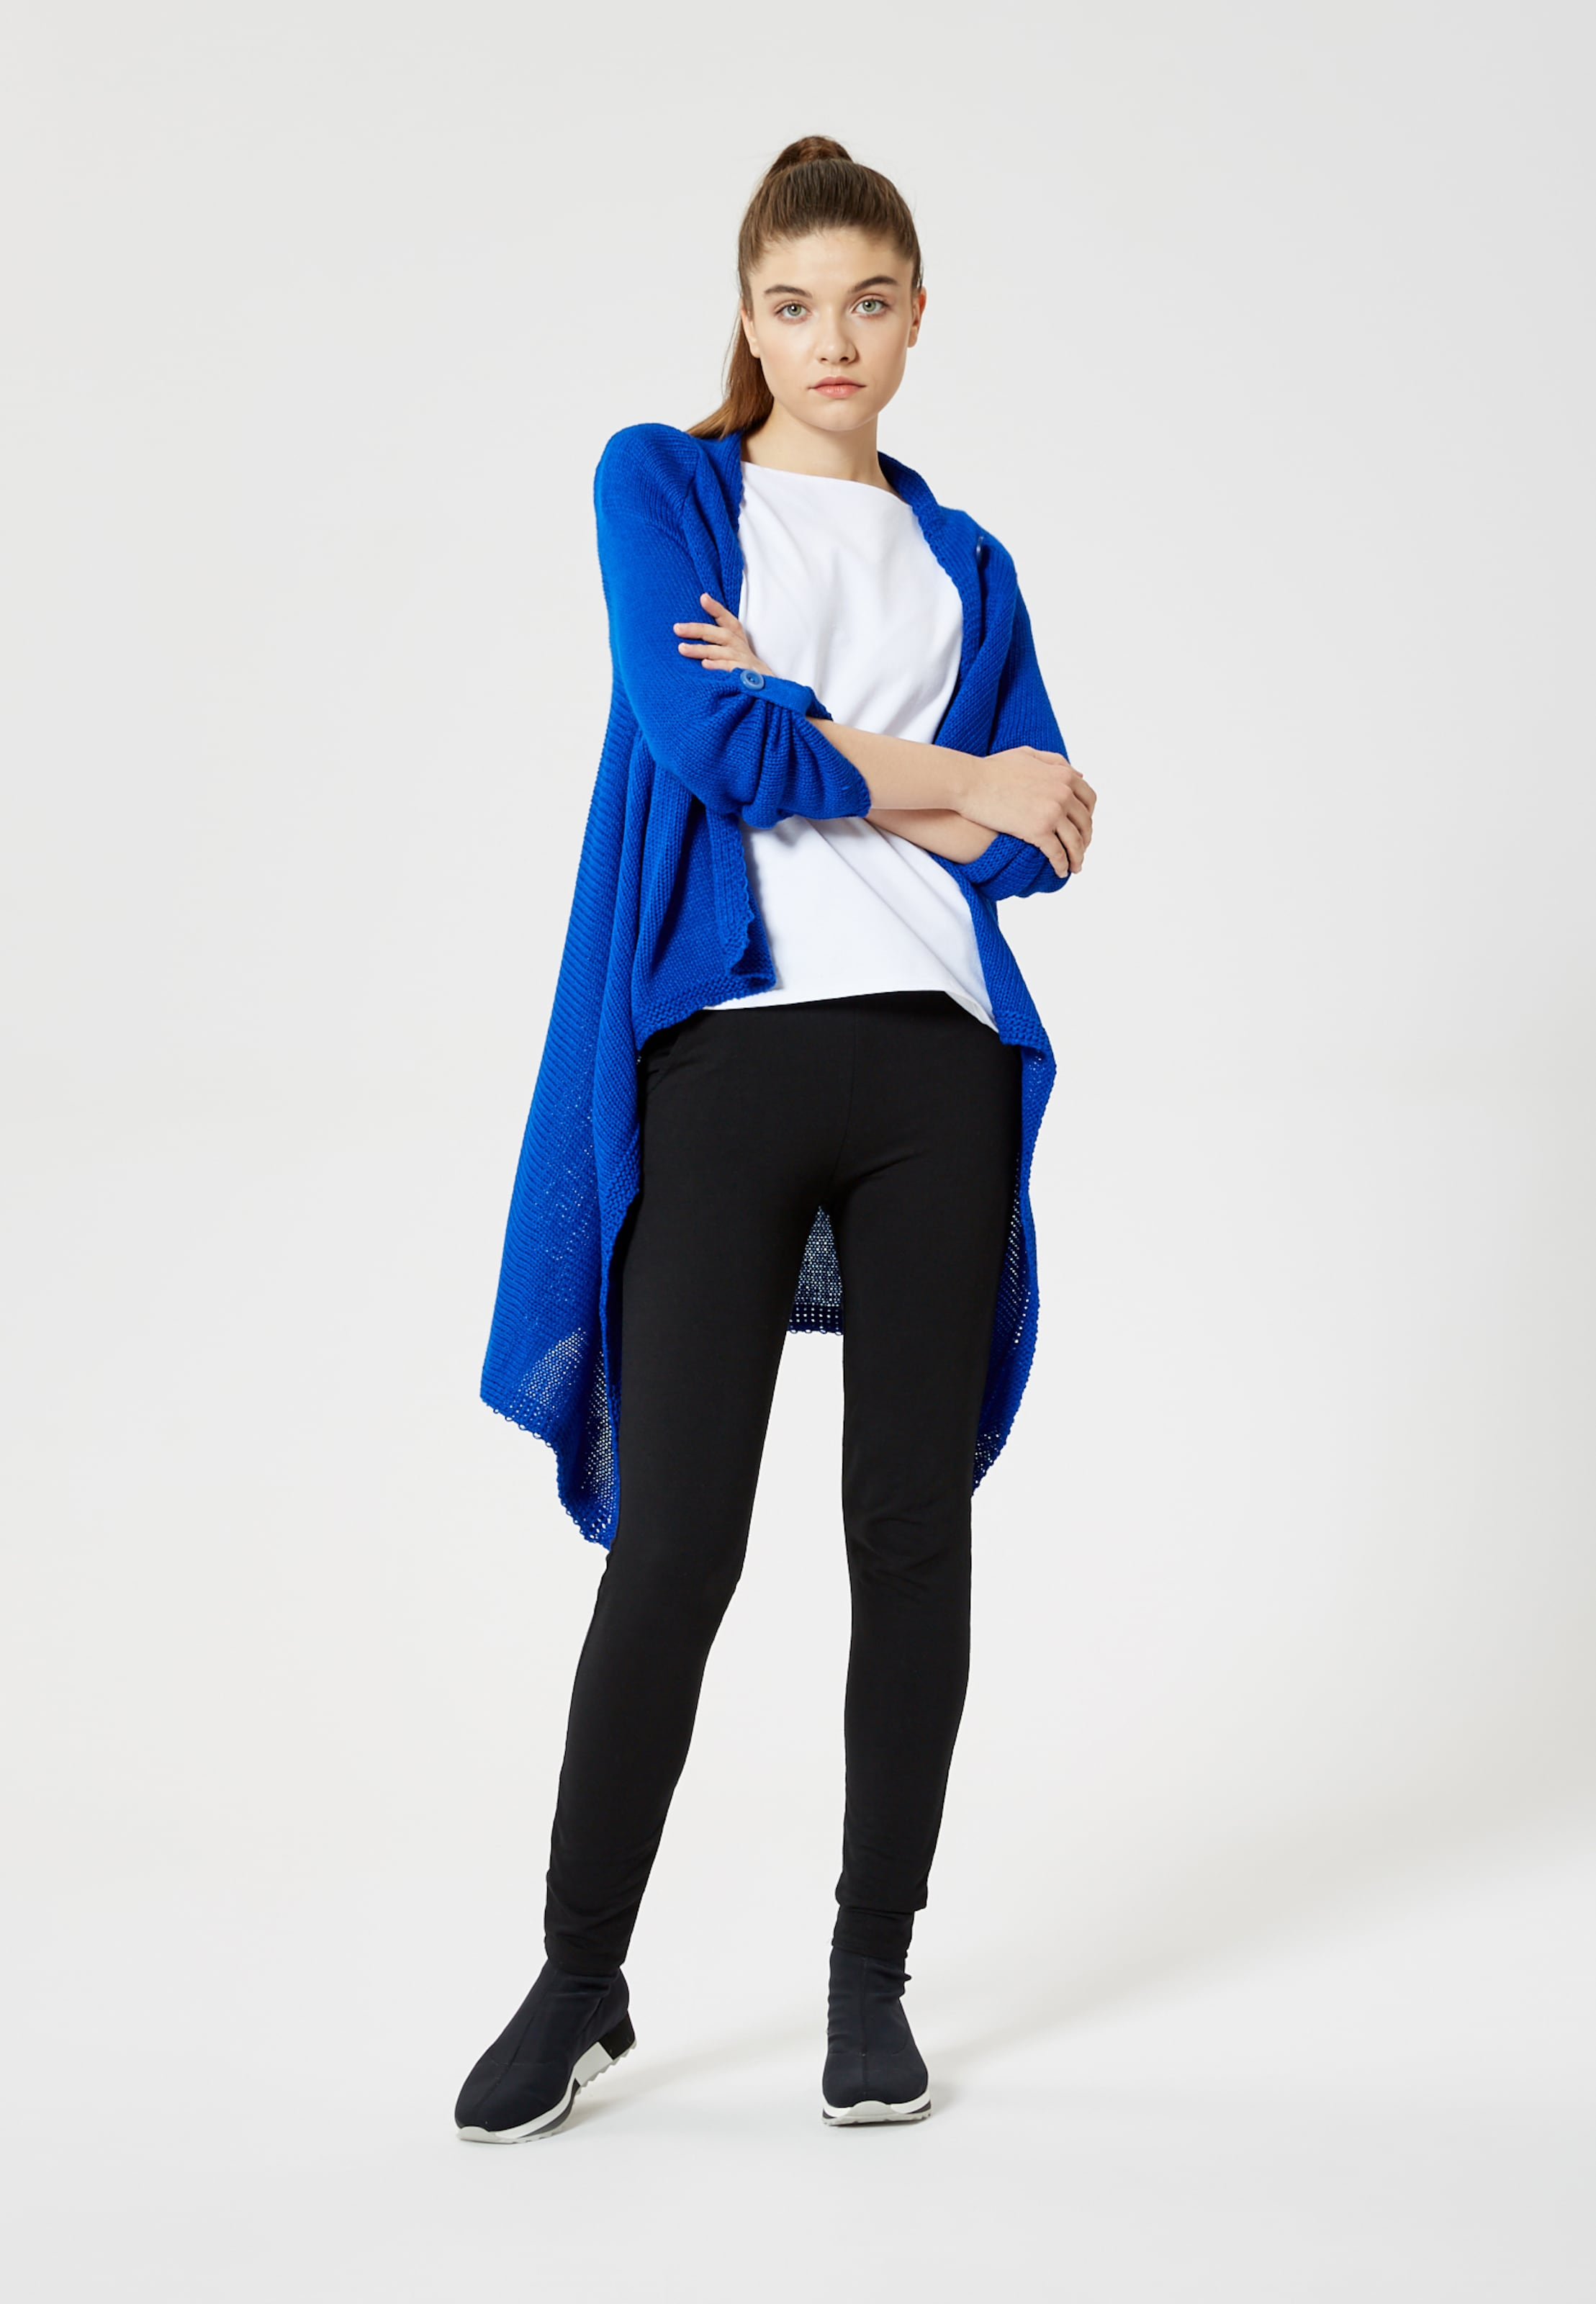 Cardigan Cardigan Bleu En Talence En Talence Cardigan En Bleu Bleu Talence NP0OkXnw8